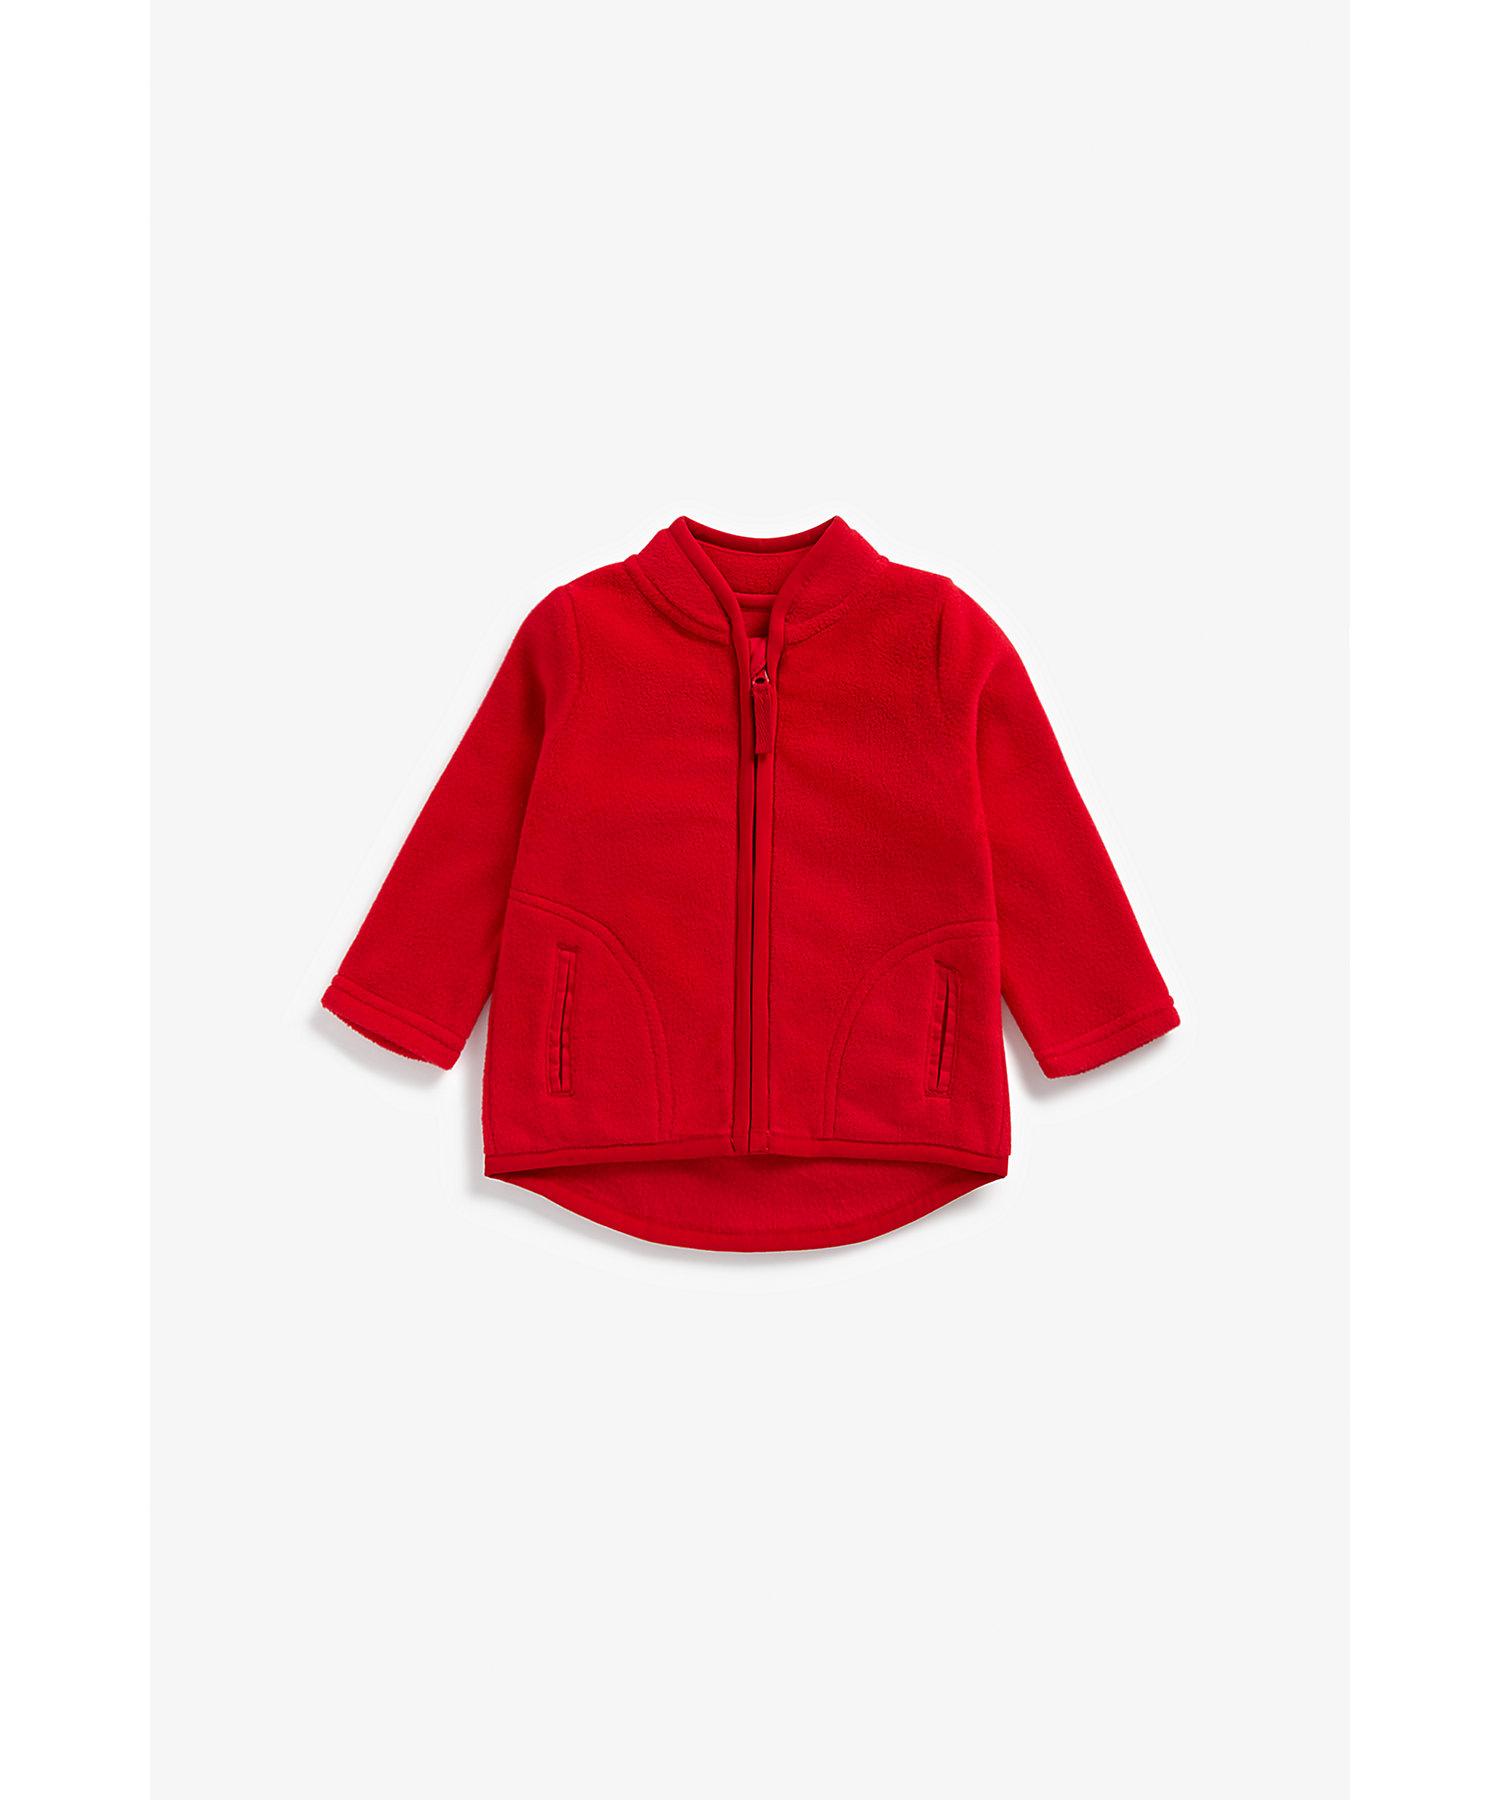 Mothercare | Girls Full Sleeves Fleece Jacket - Red